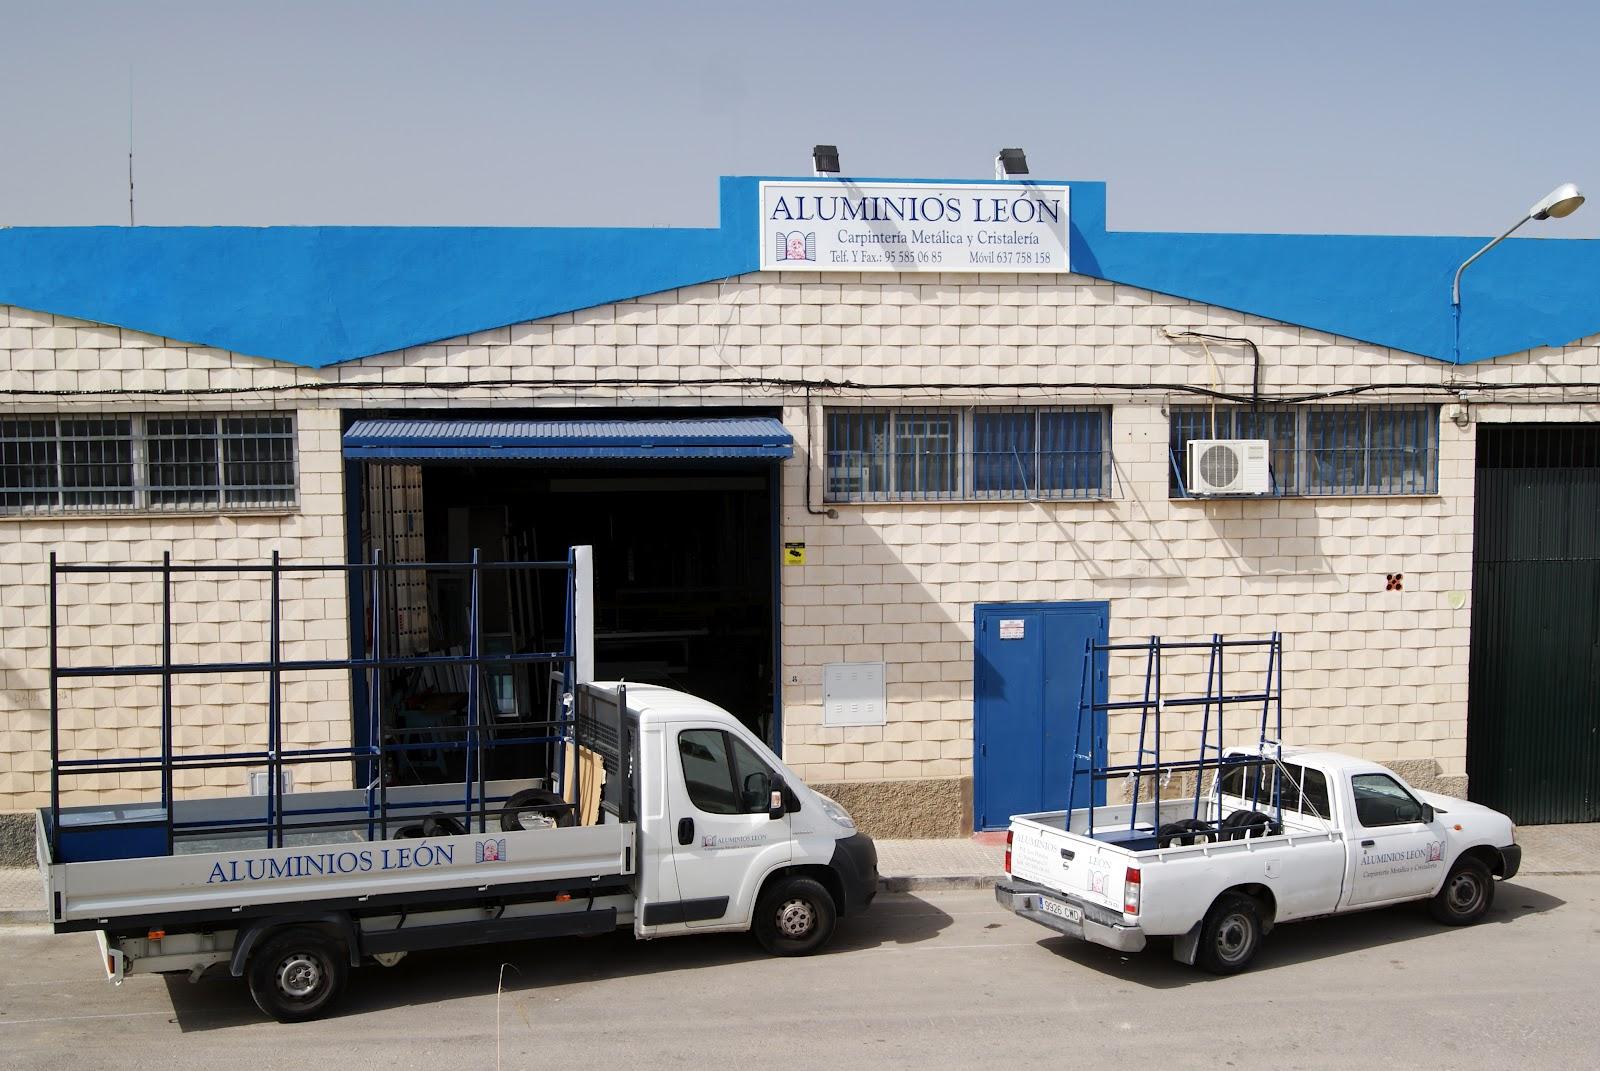 aluminios leon